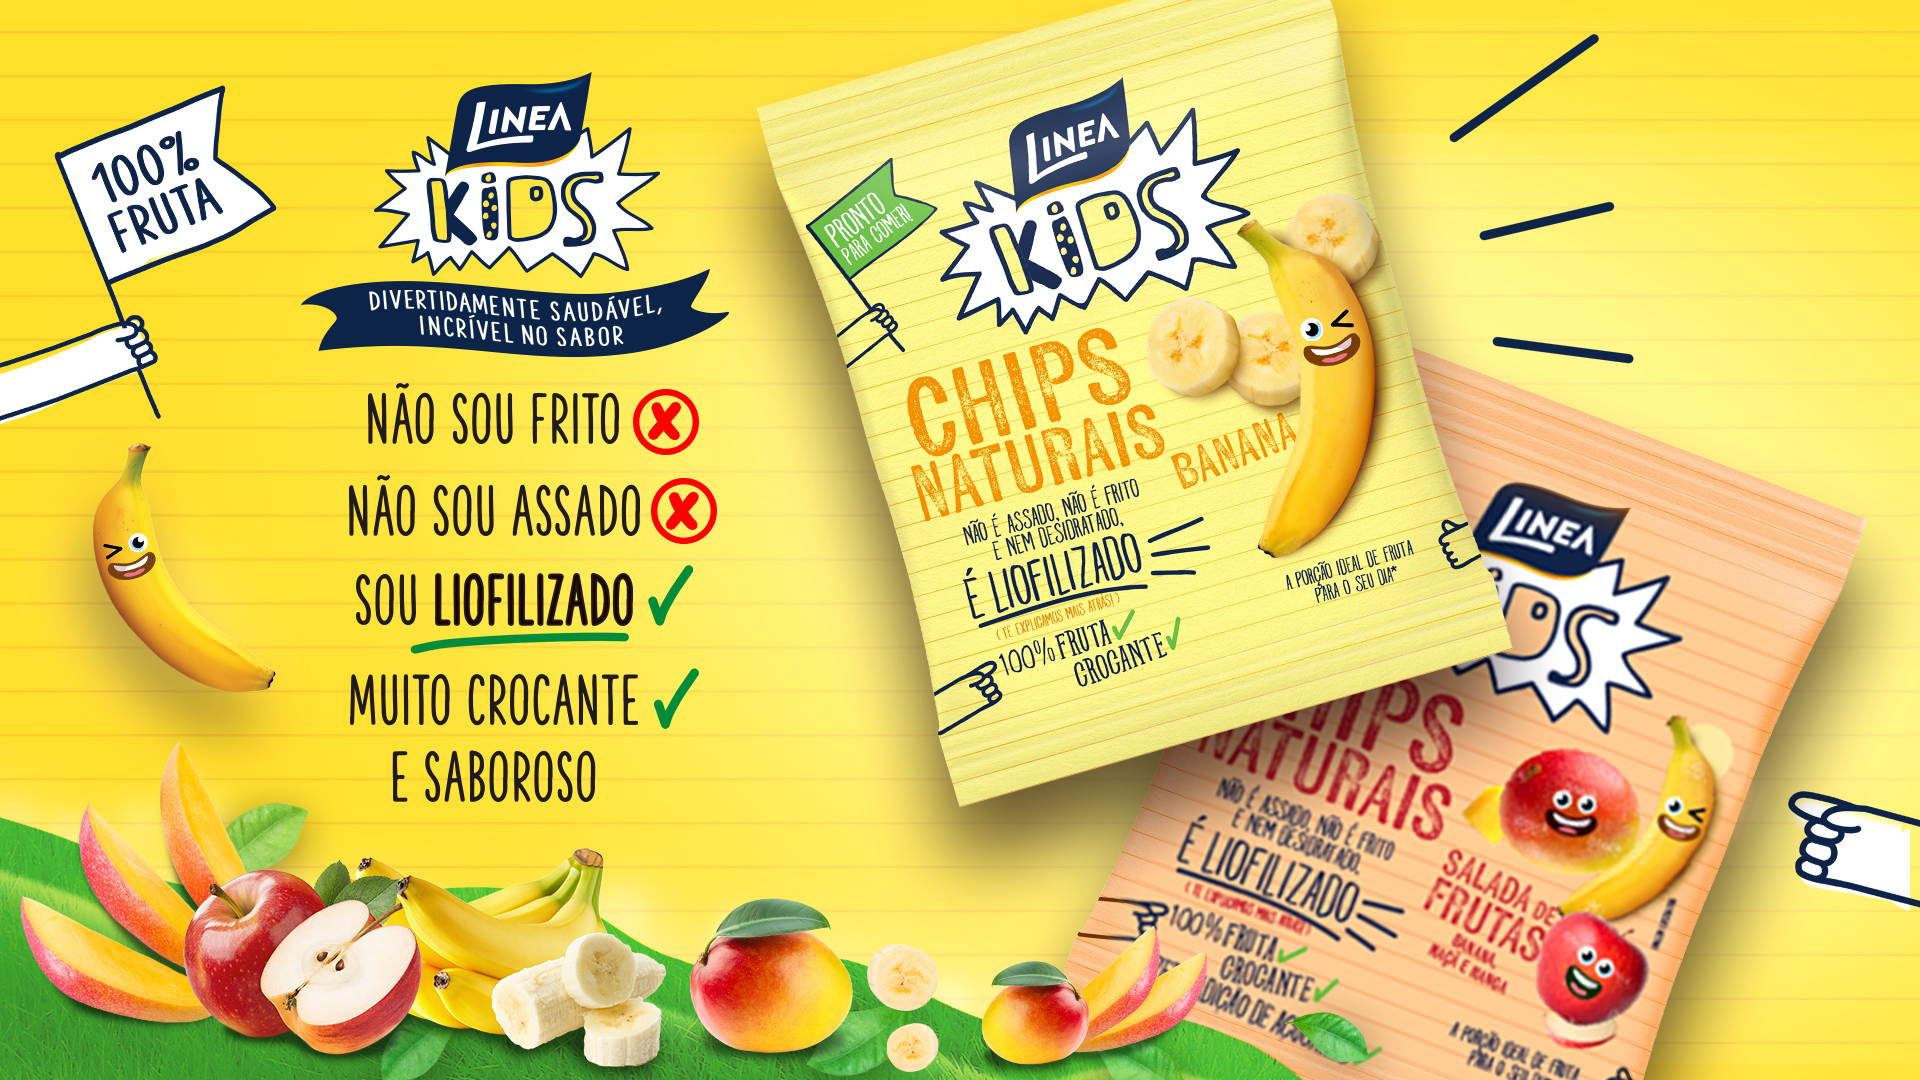 Linea Chips de Banana